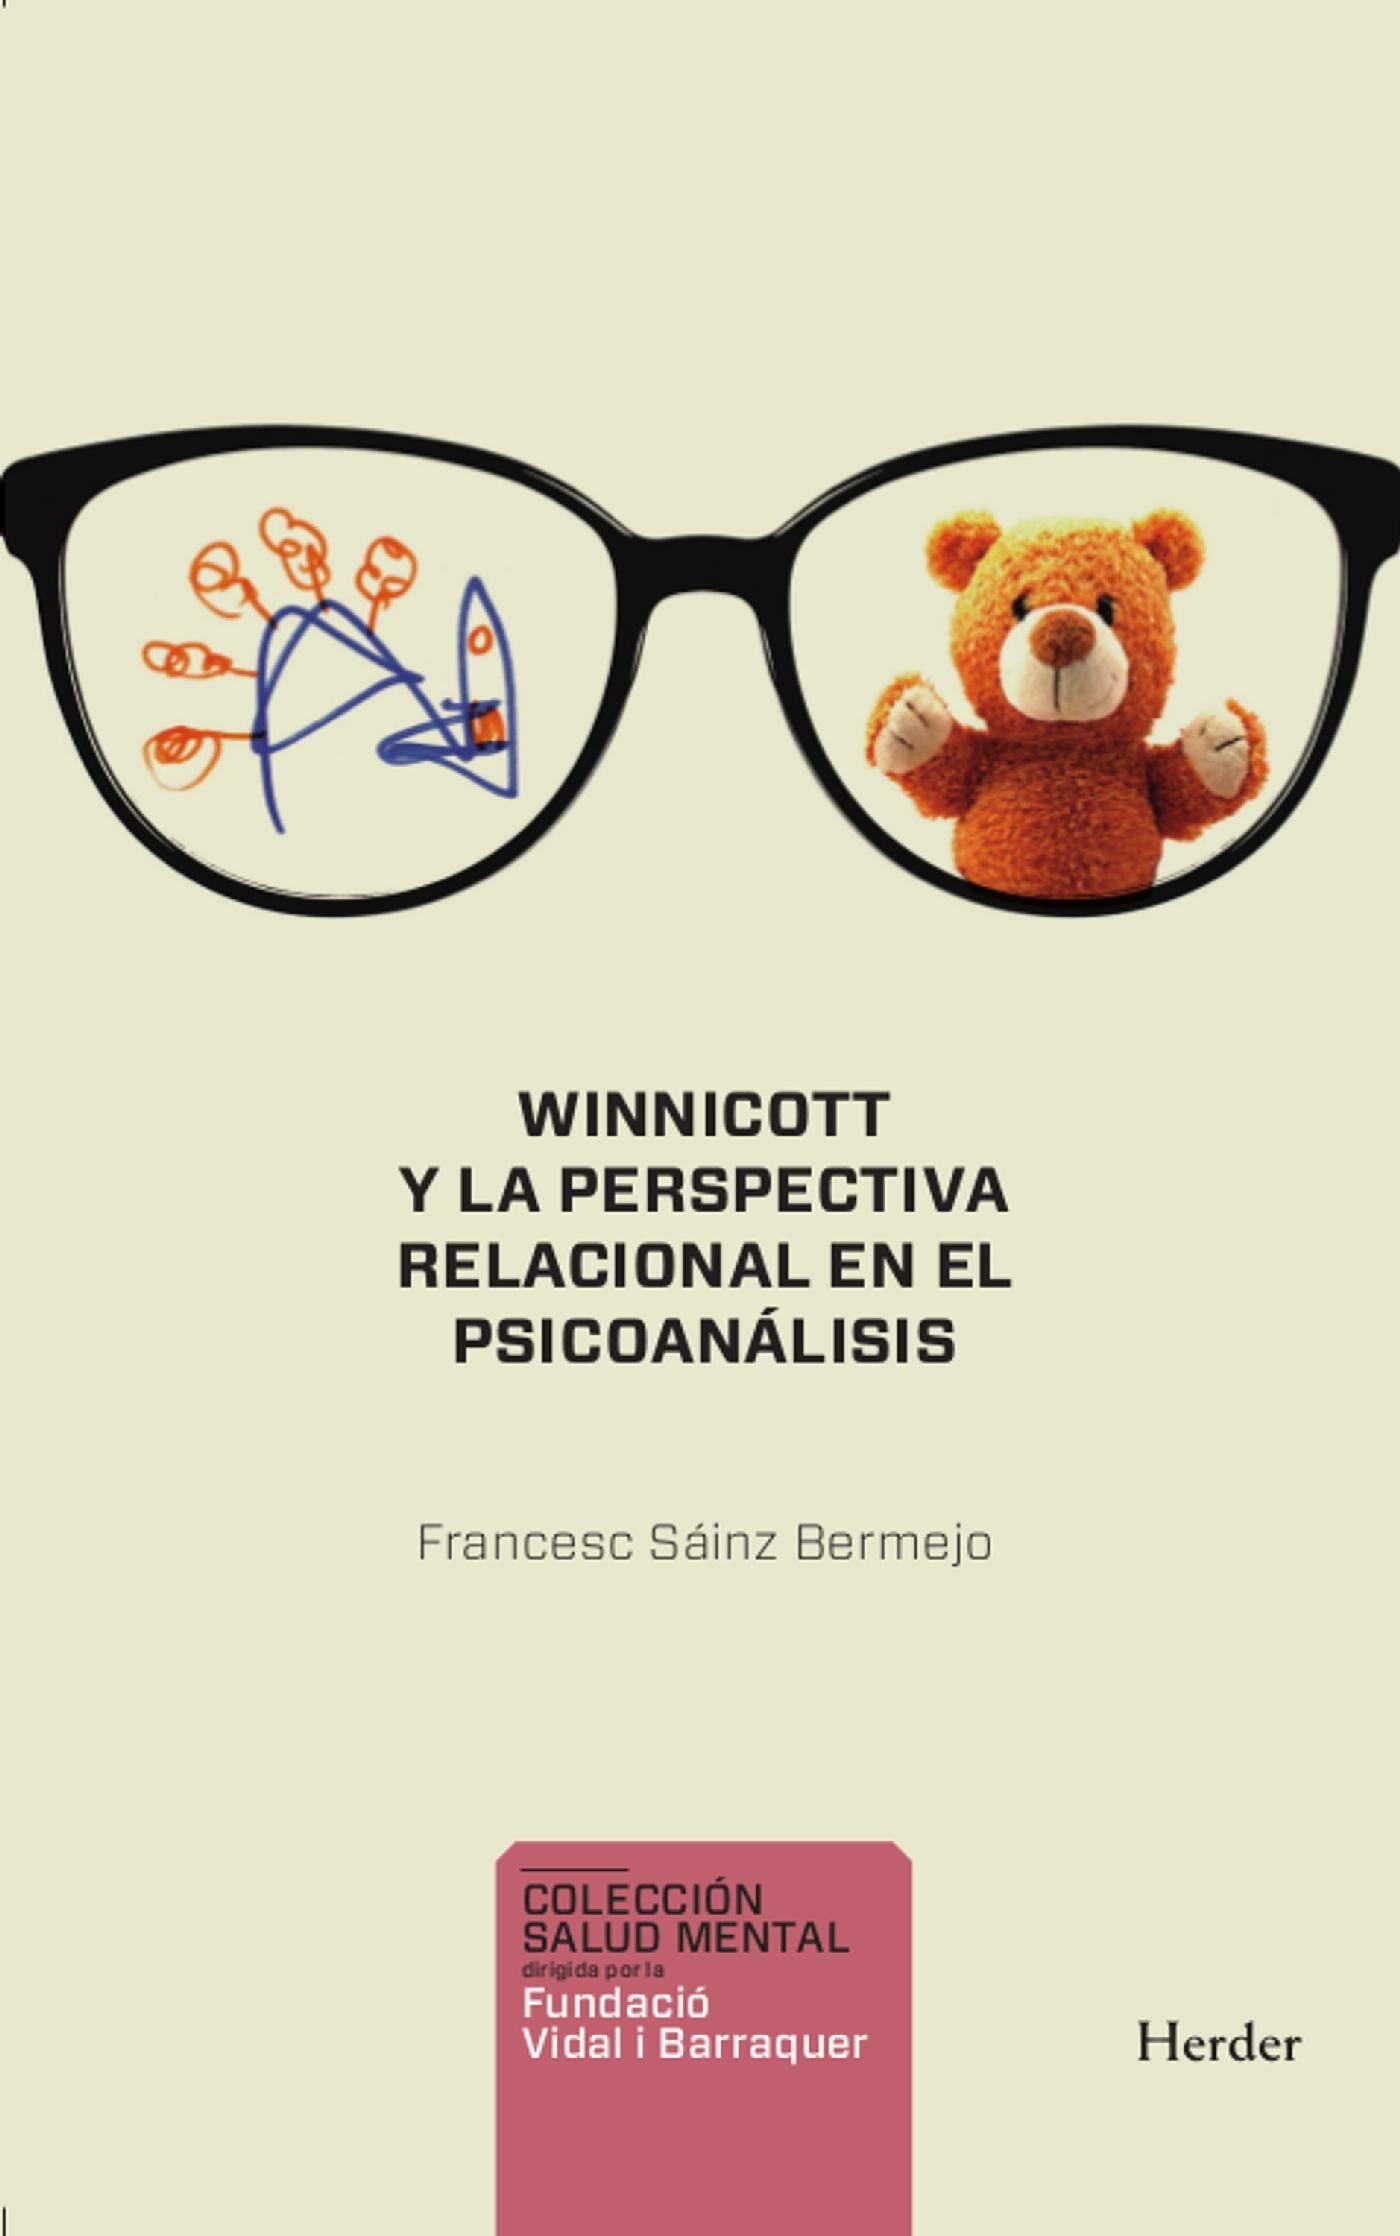 Winnicott Y La Perspectiva Relacional En Psicoanálisis   por Francesc Sainz Bermejo